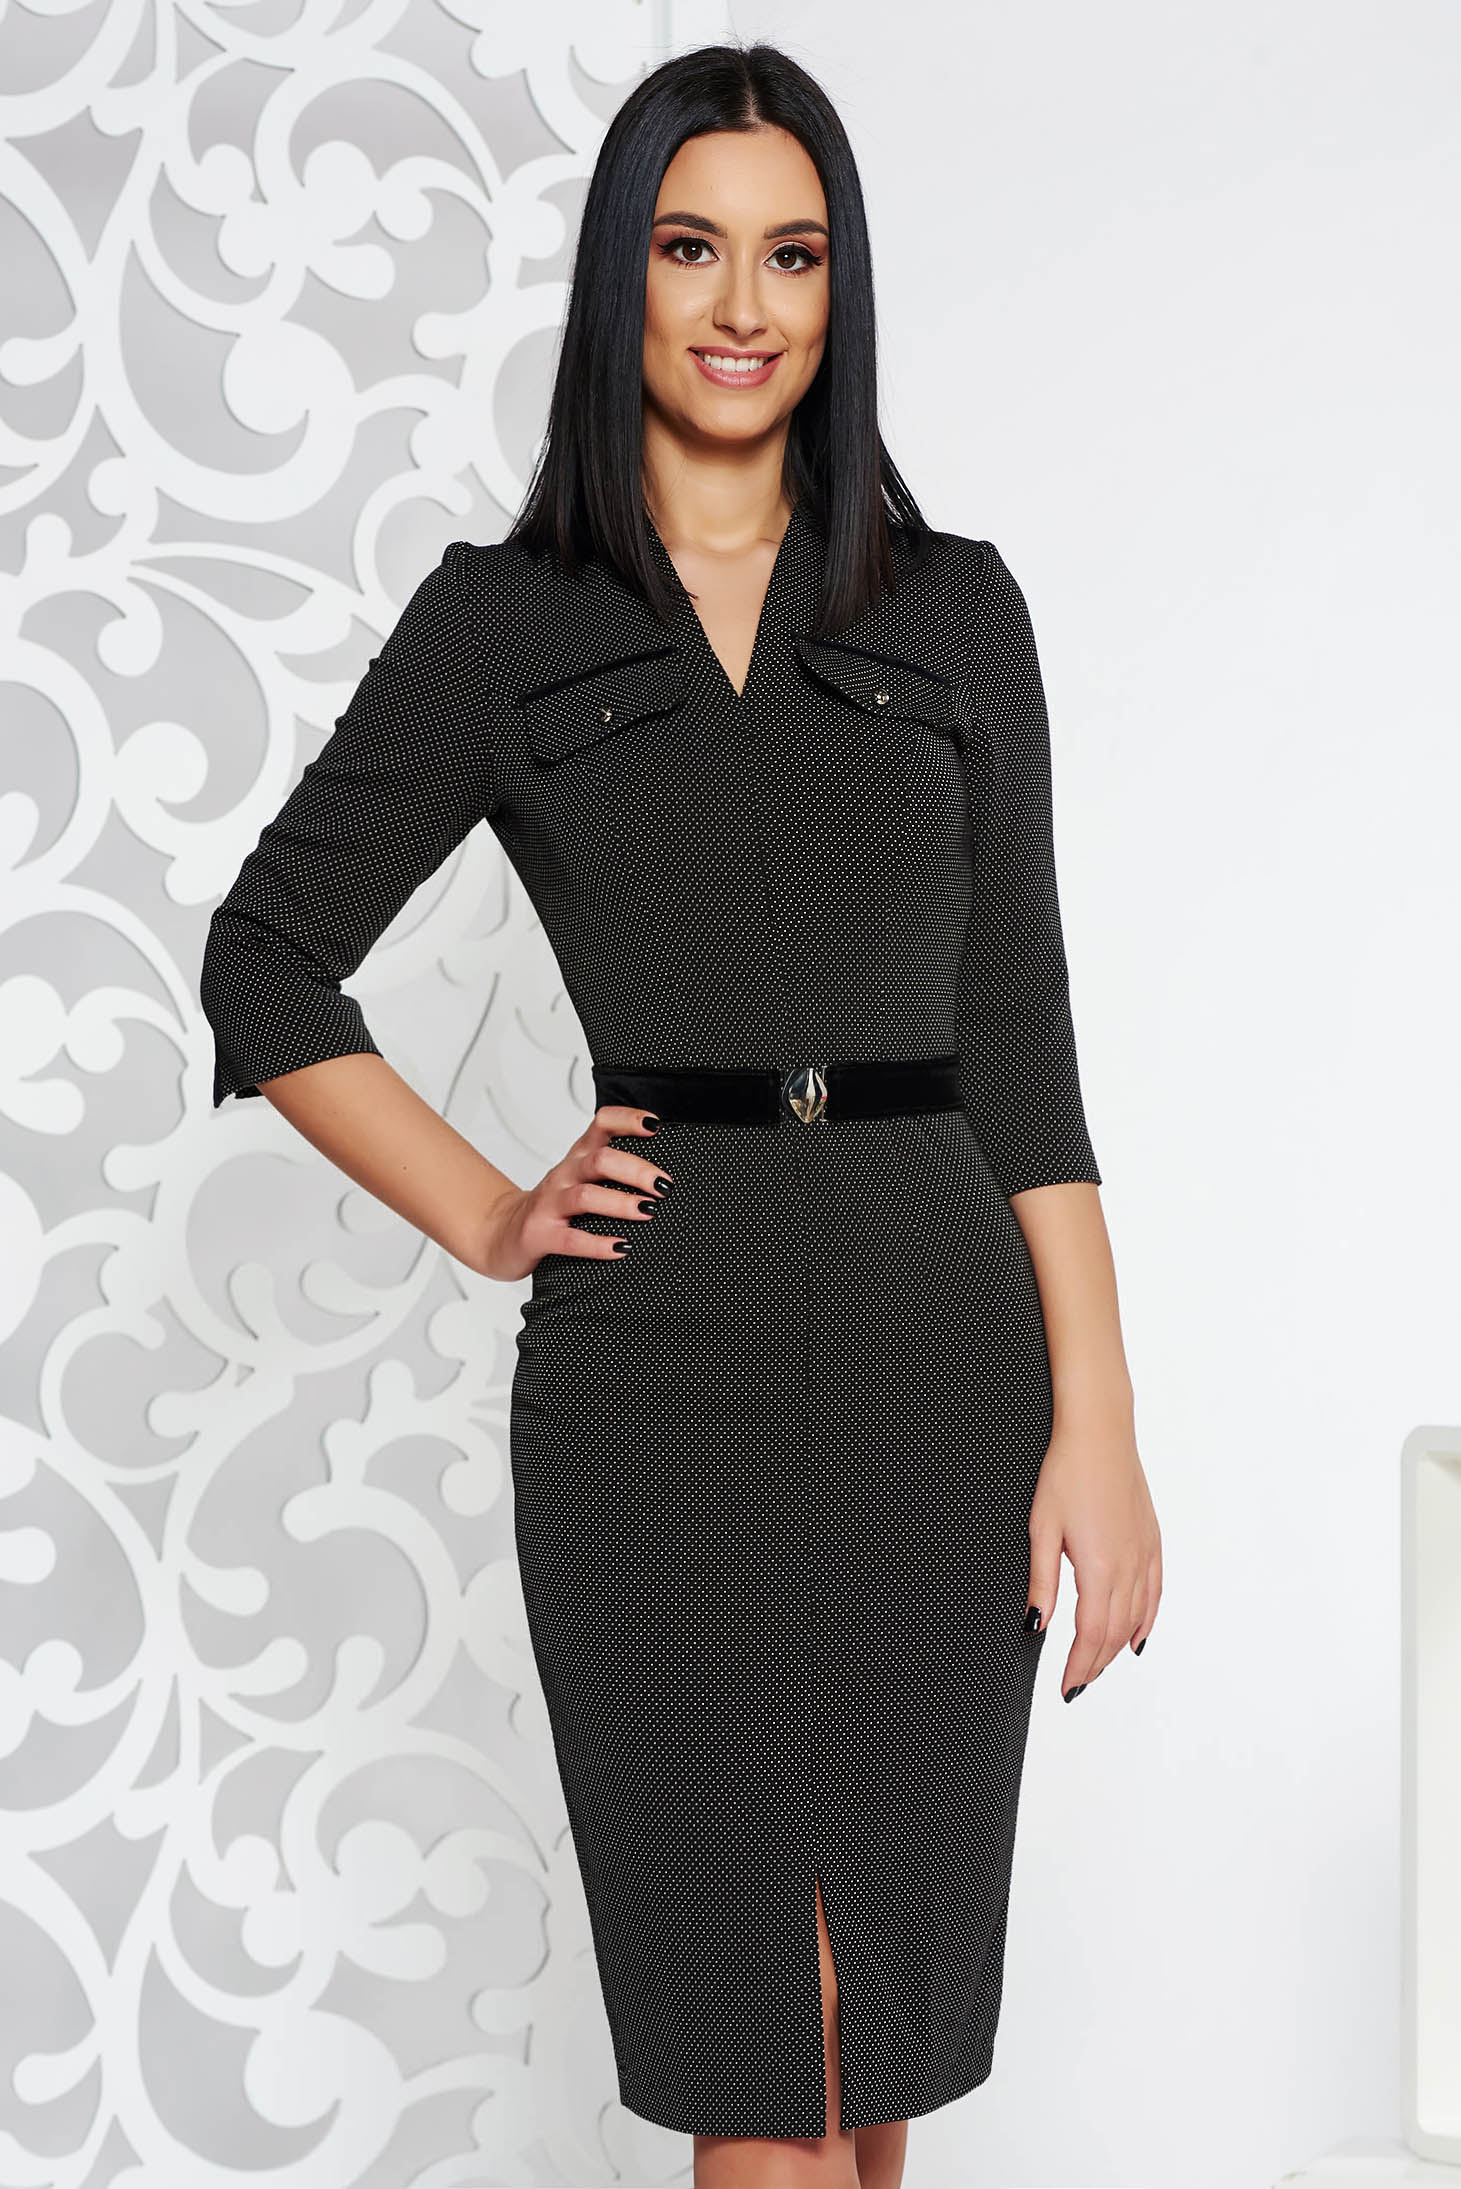 Rochie neagra office tip creion din material elastic accesorizata cu cordon